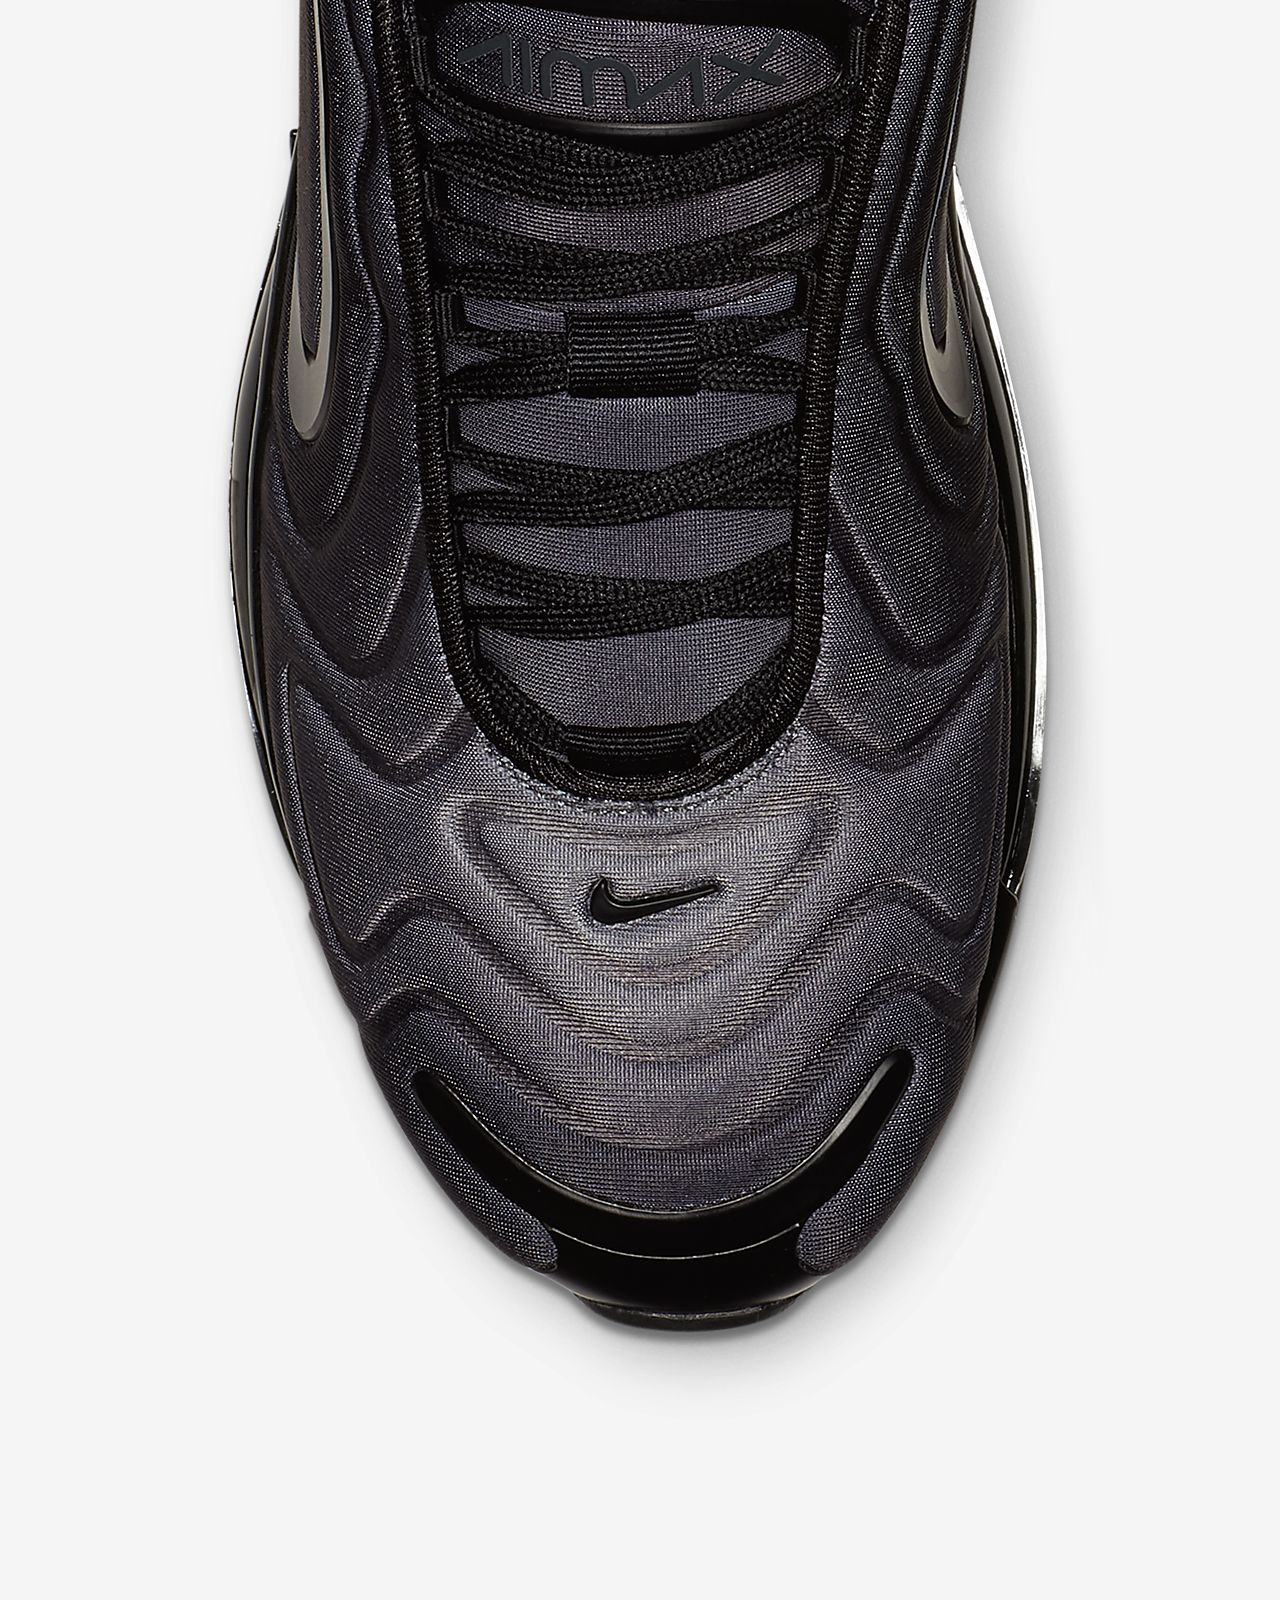 promo code b77a3 1ba35 720 Chaussure Nike Max Pour Air Fr Femme p7trS7wvxn